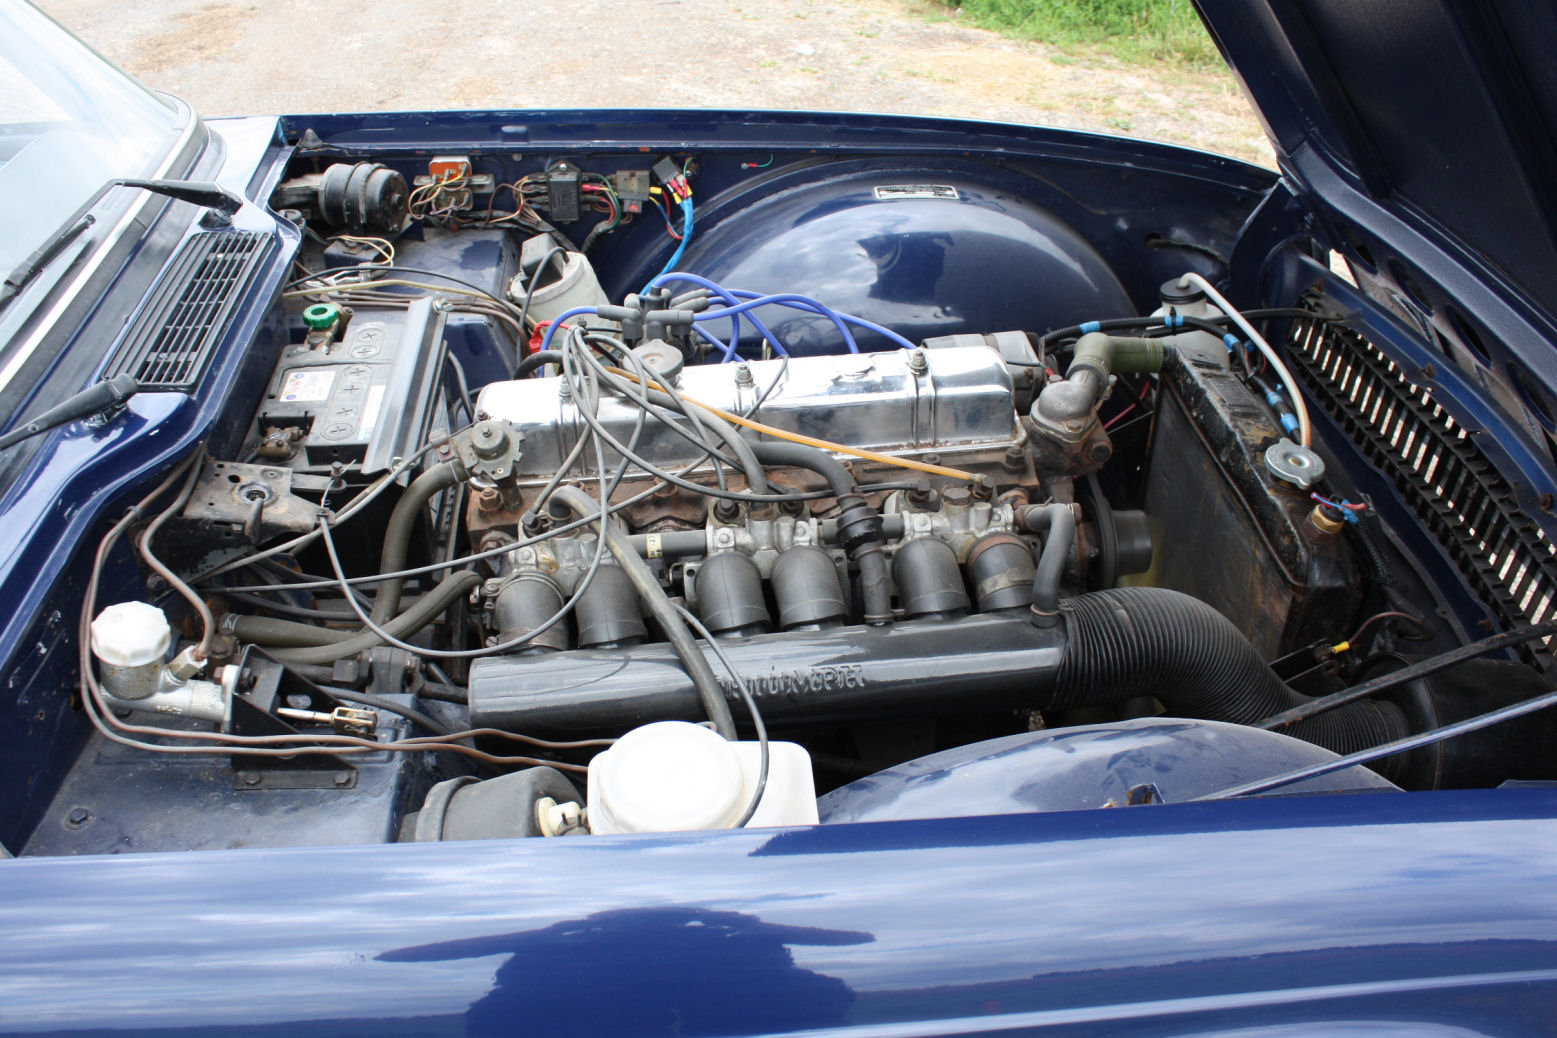 1972 TRIUMPH TR6 ORIGINAL 150BHP UK CAR IN BLUE SOLD (picture 4 of 6)